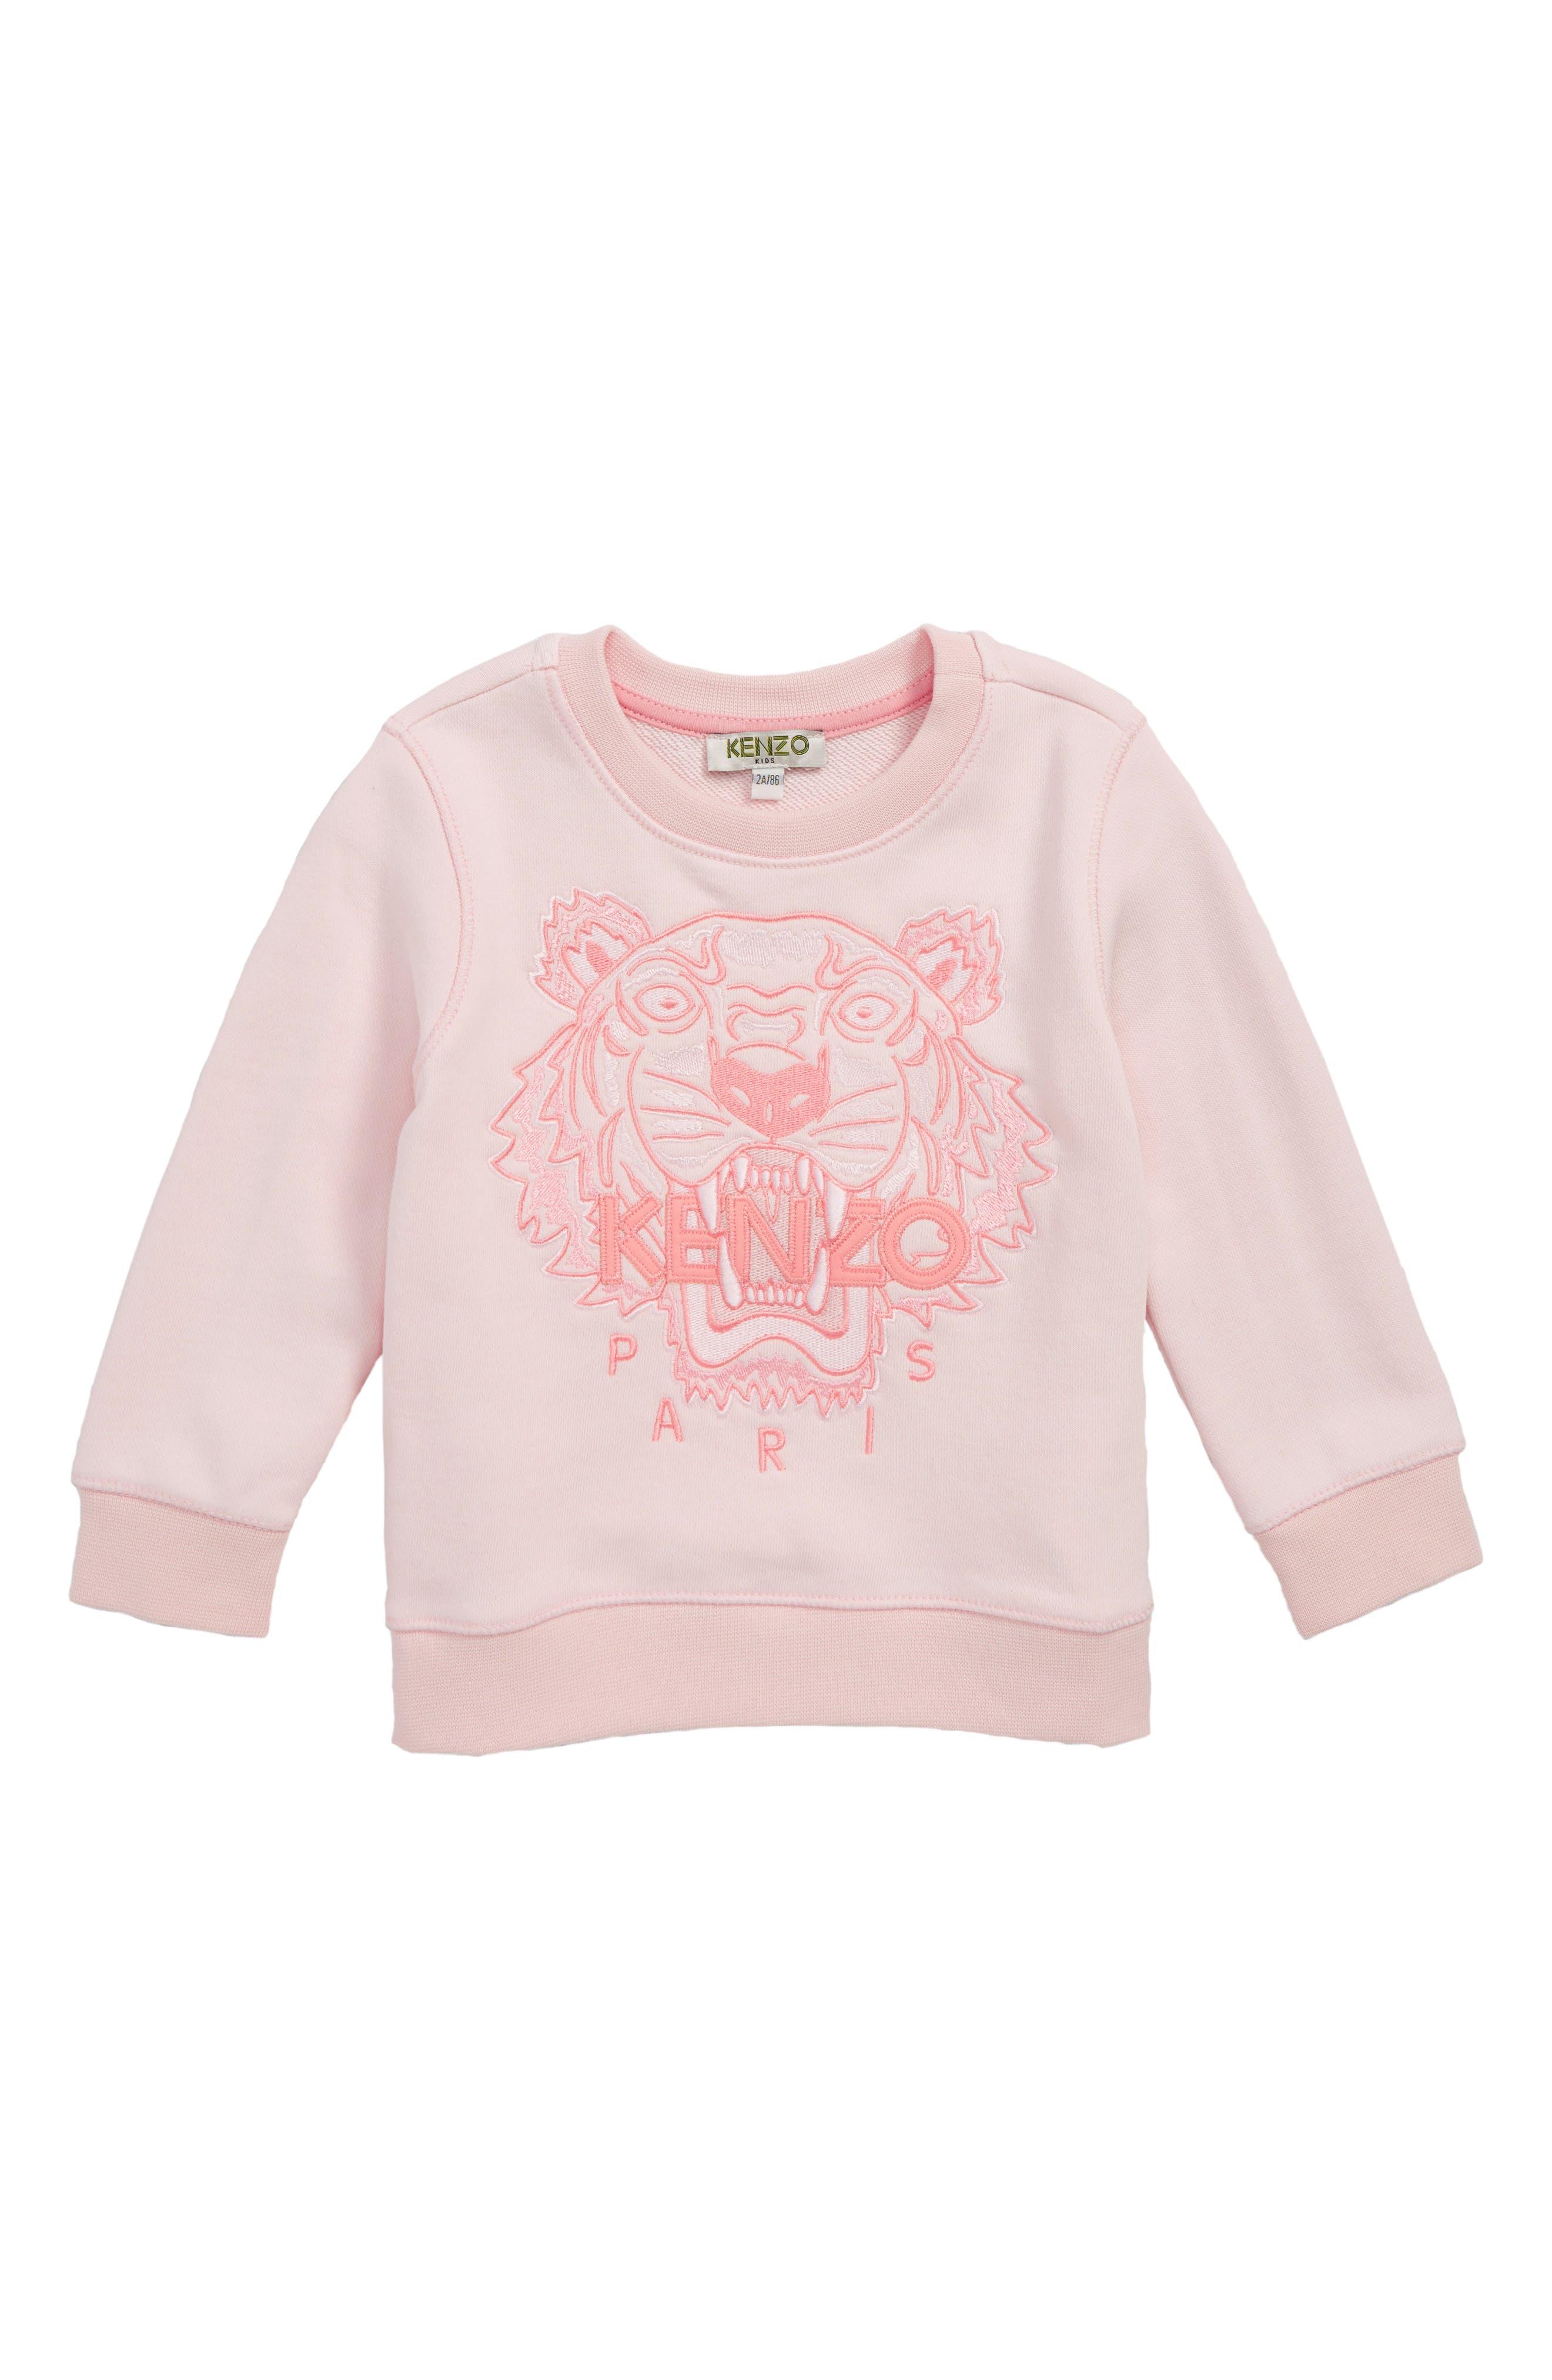 bf99c612c5 Kids  KENZO Apparel  T-Shirts